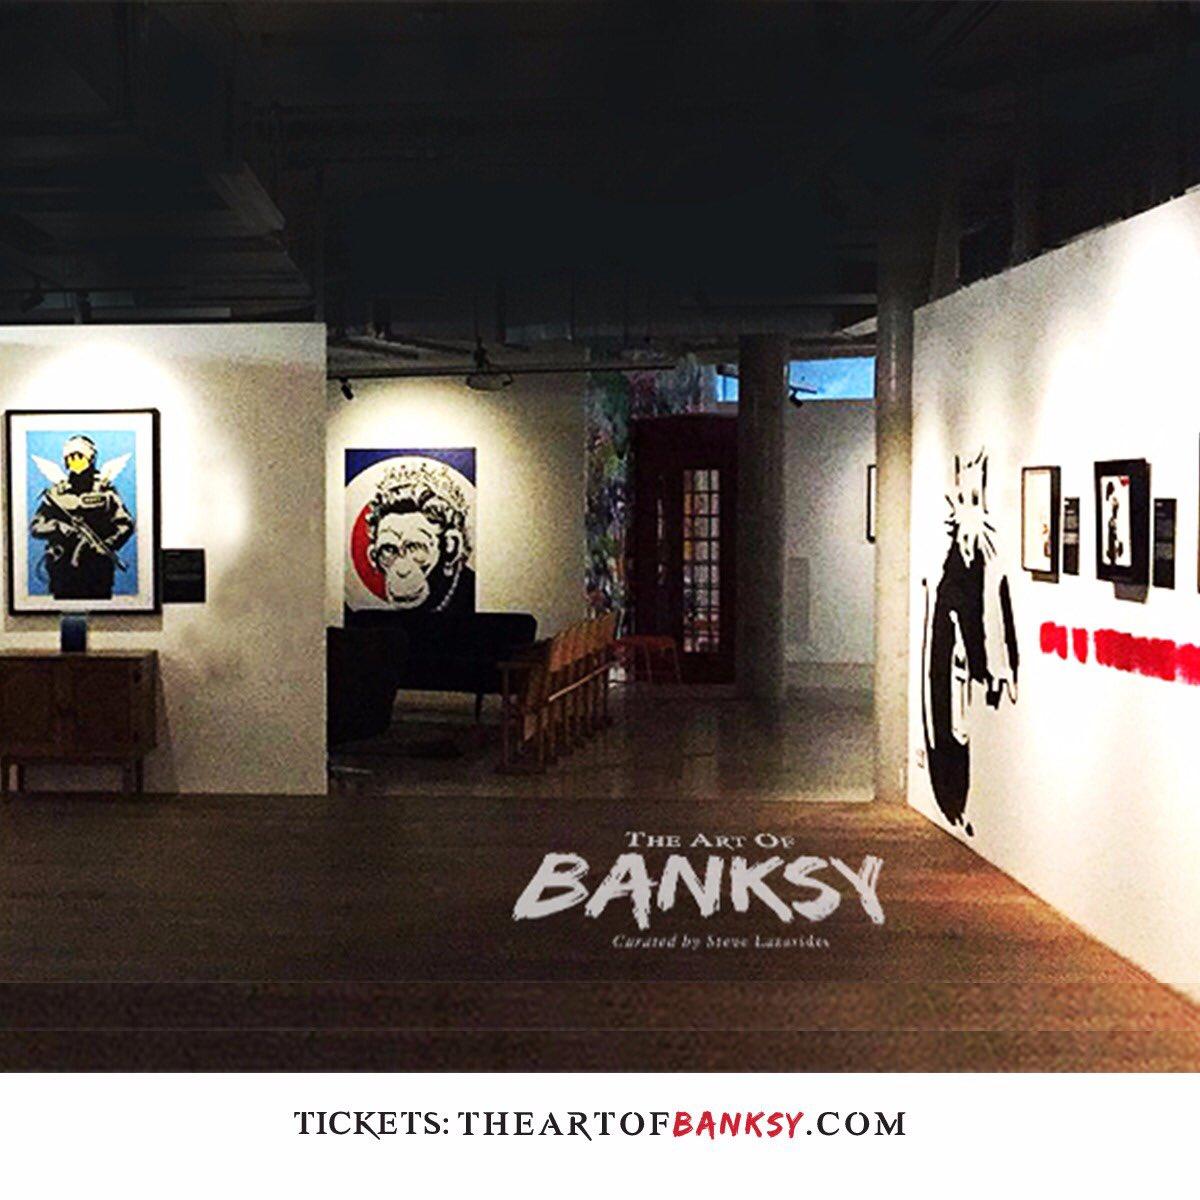 Exhibition Art Of Banksy Twitter On The oWrCxeBQd